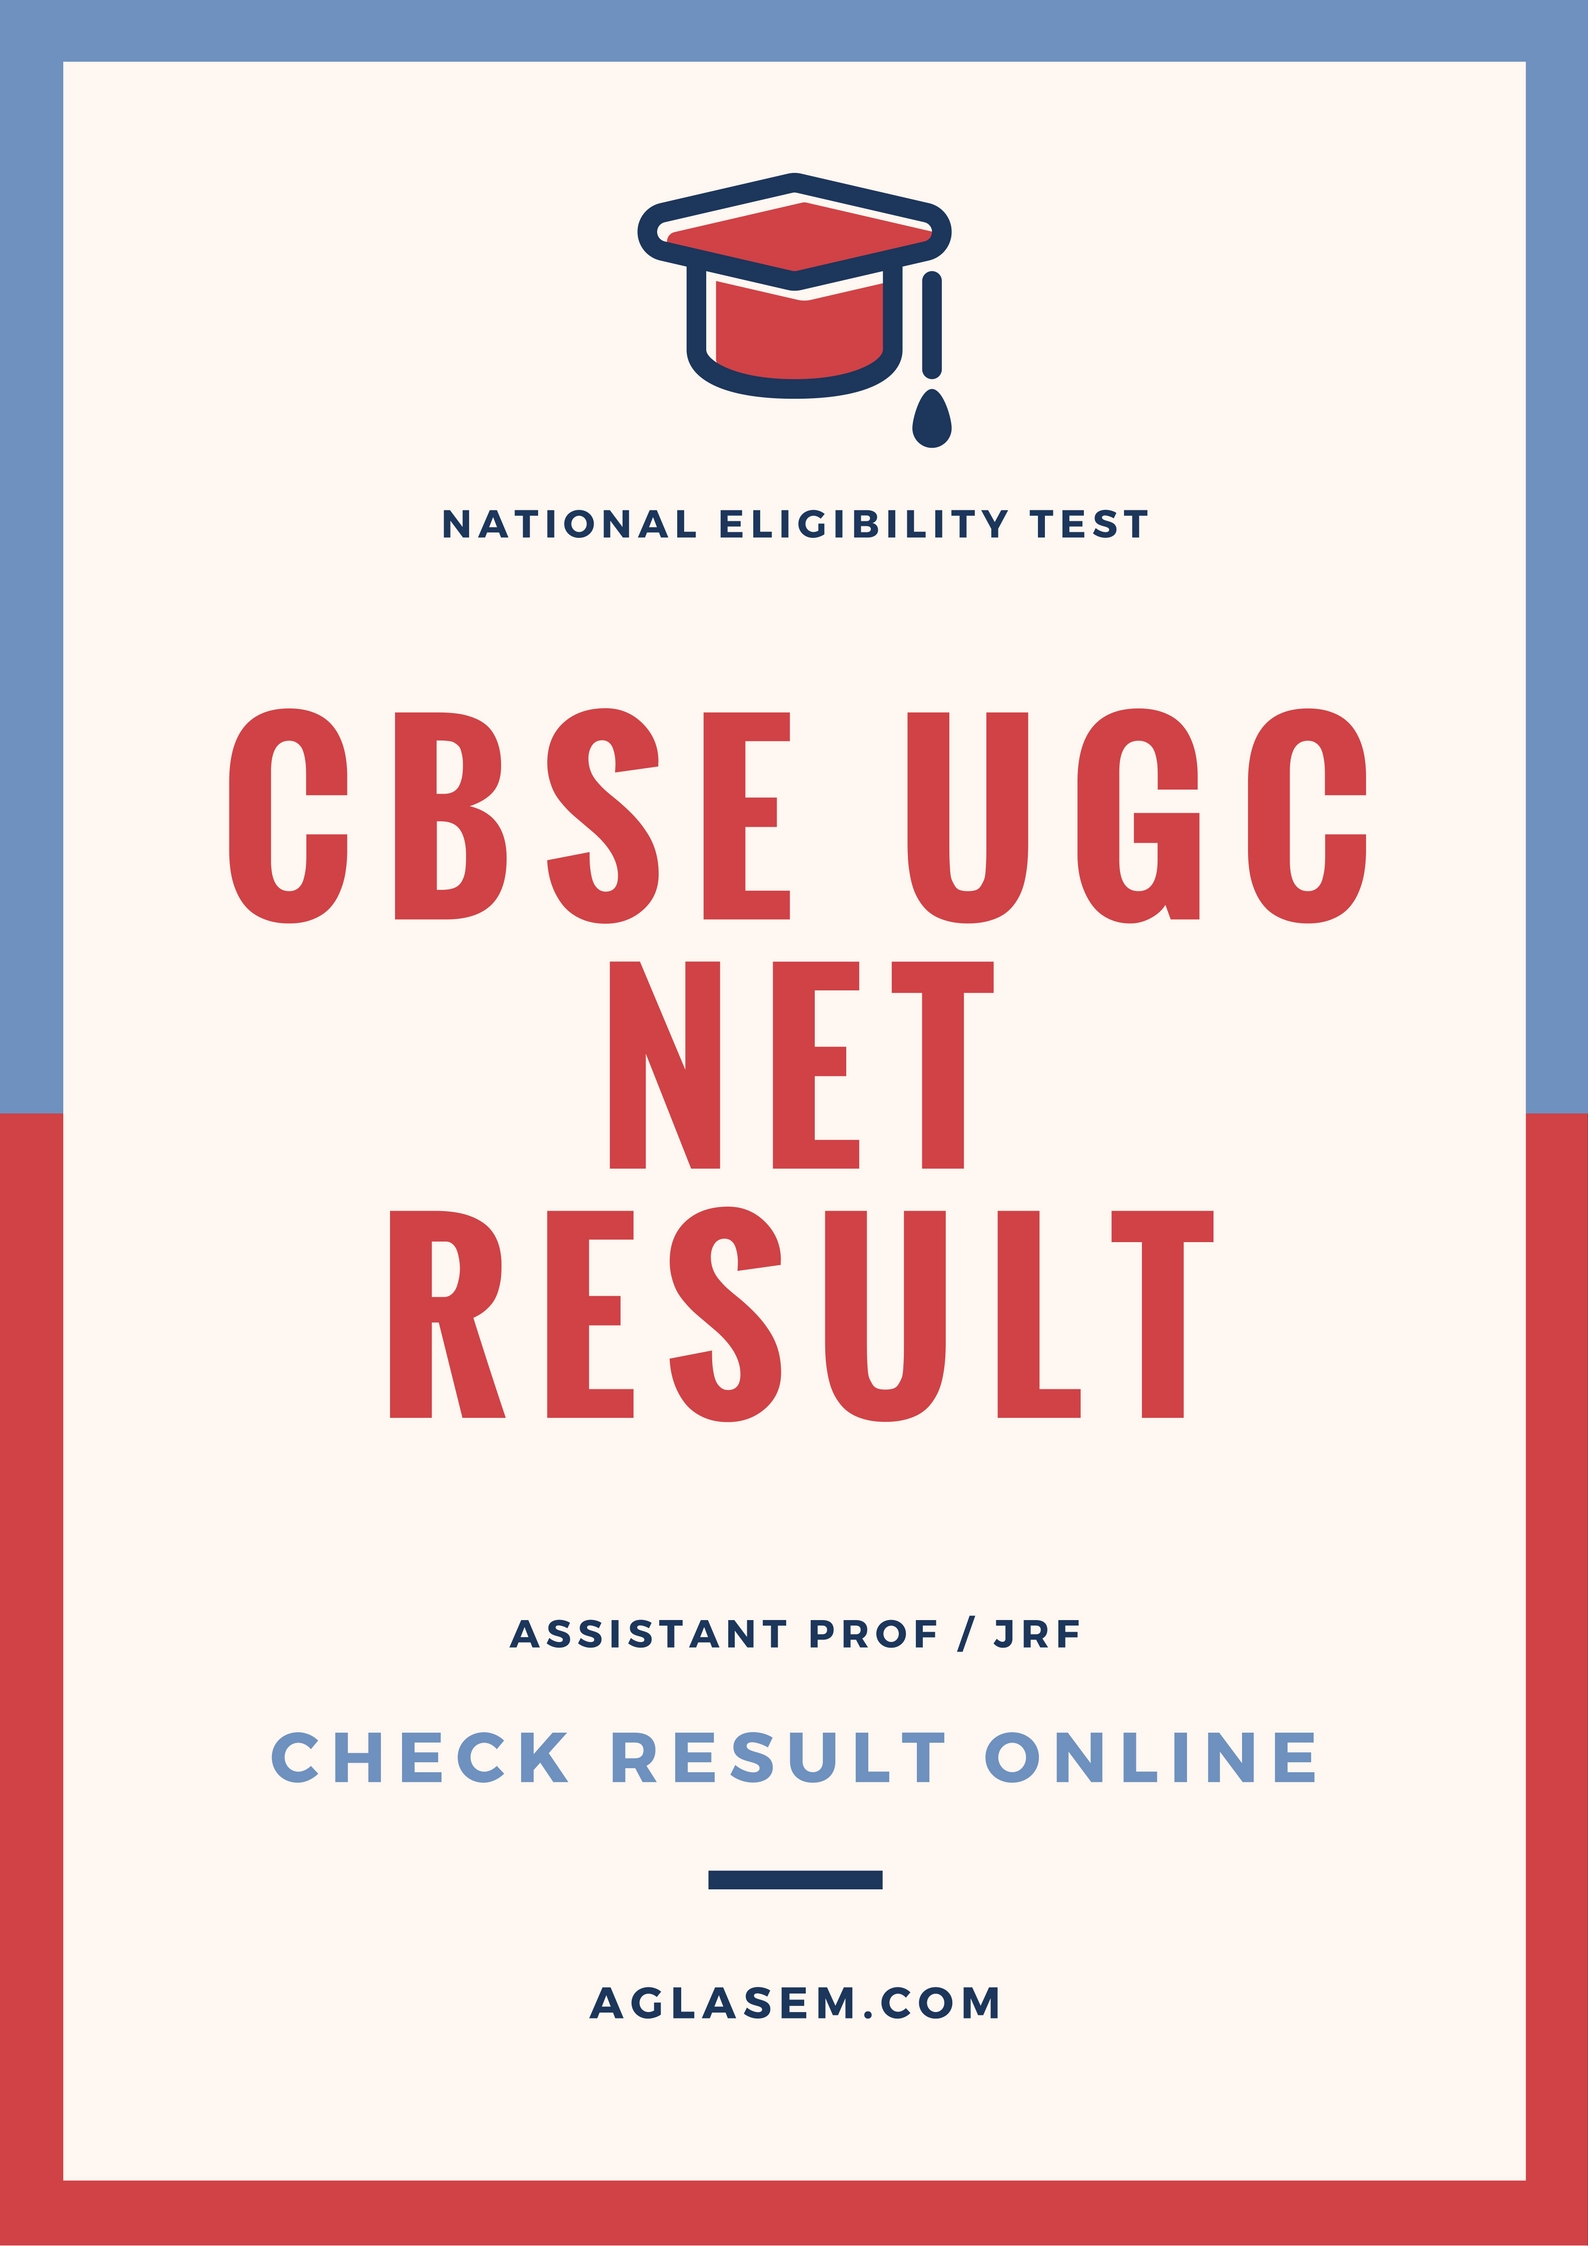 cbse ugc net result 2016 july cut declared check